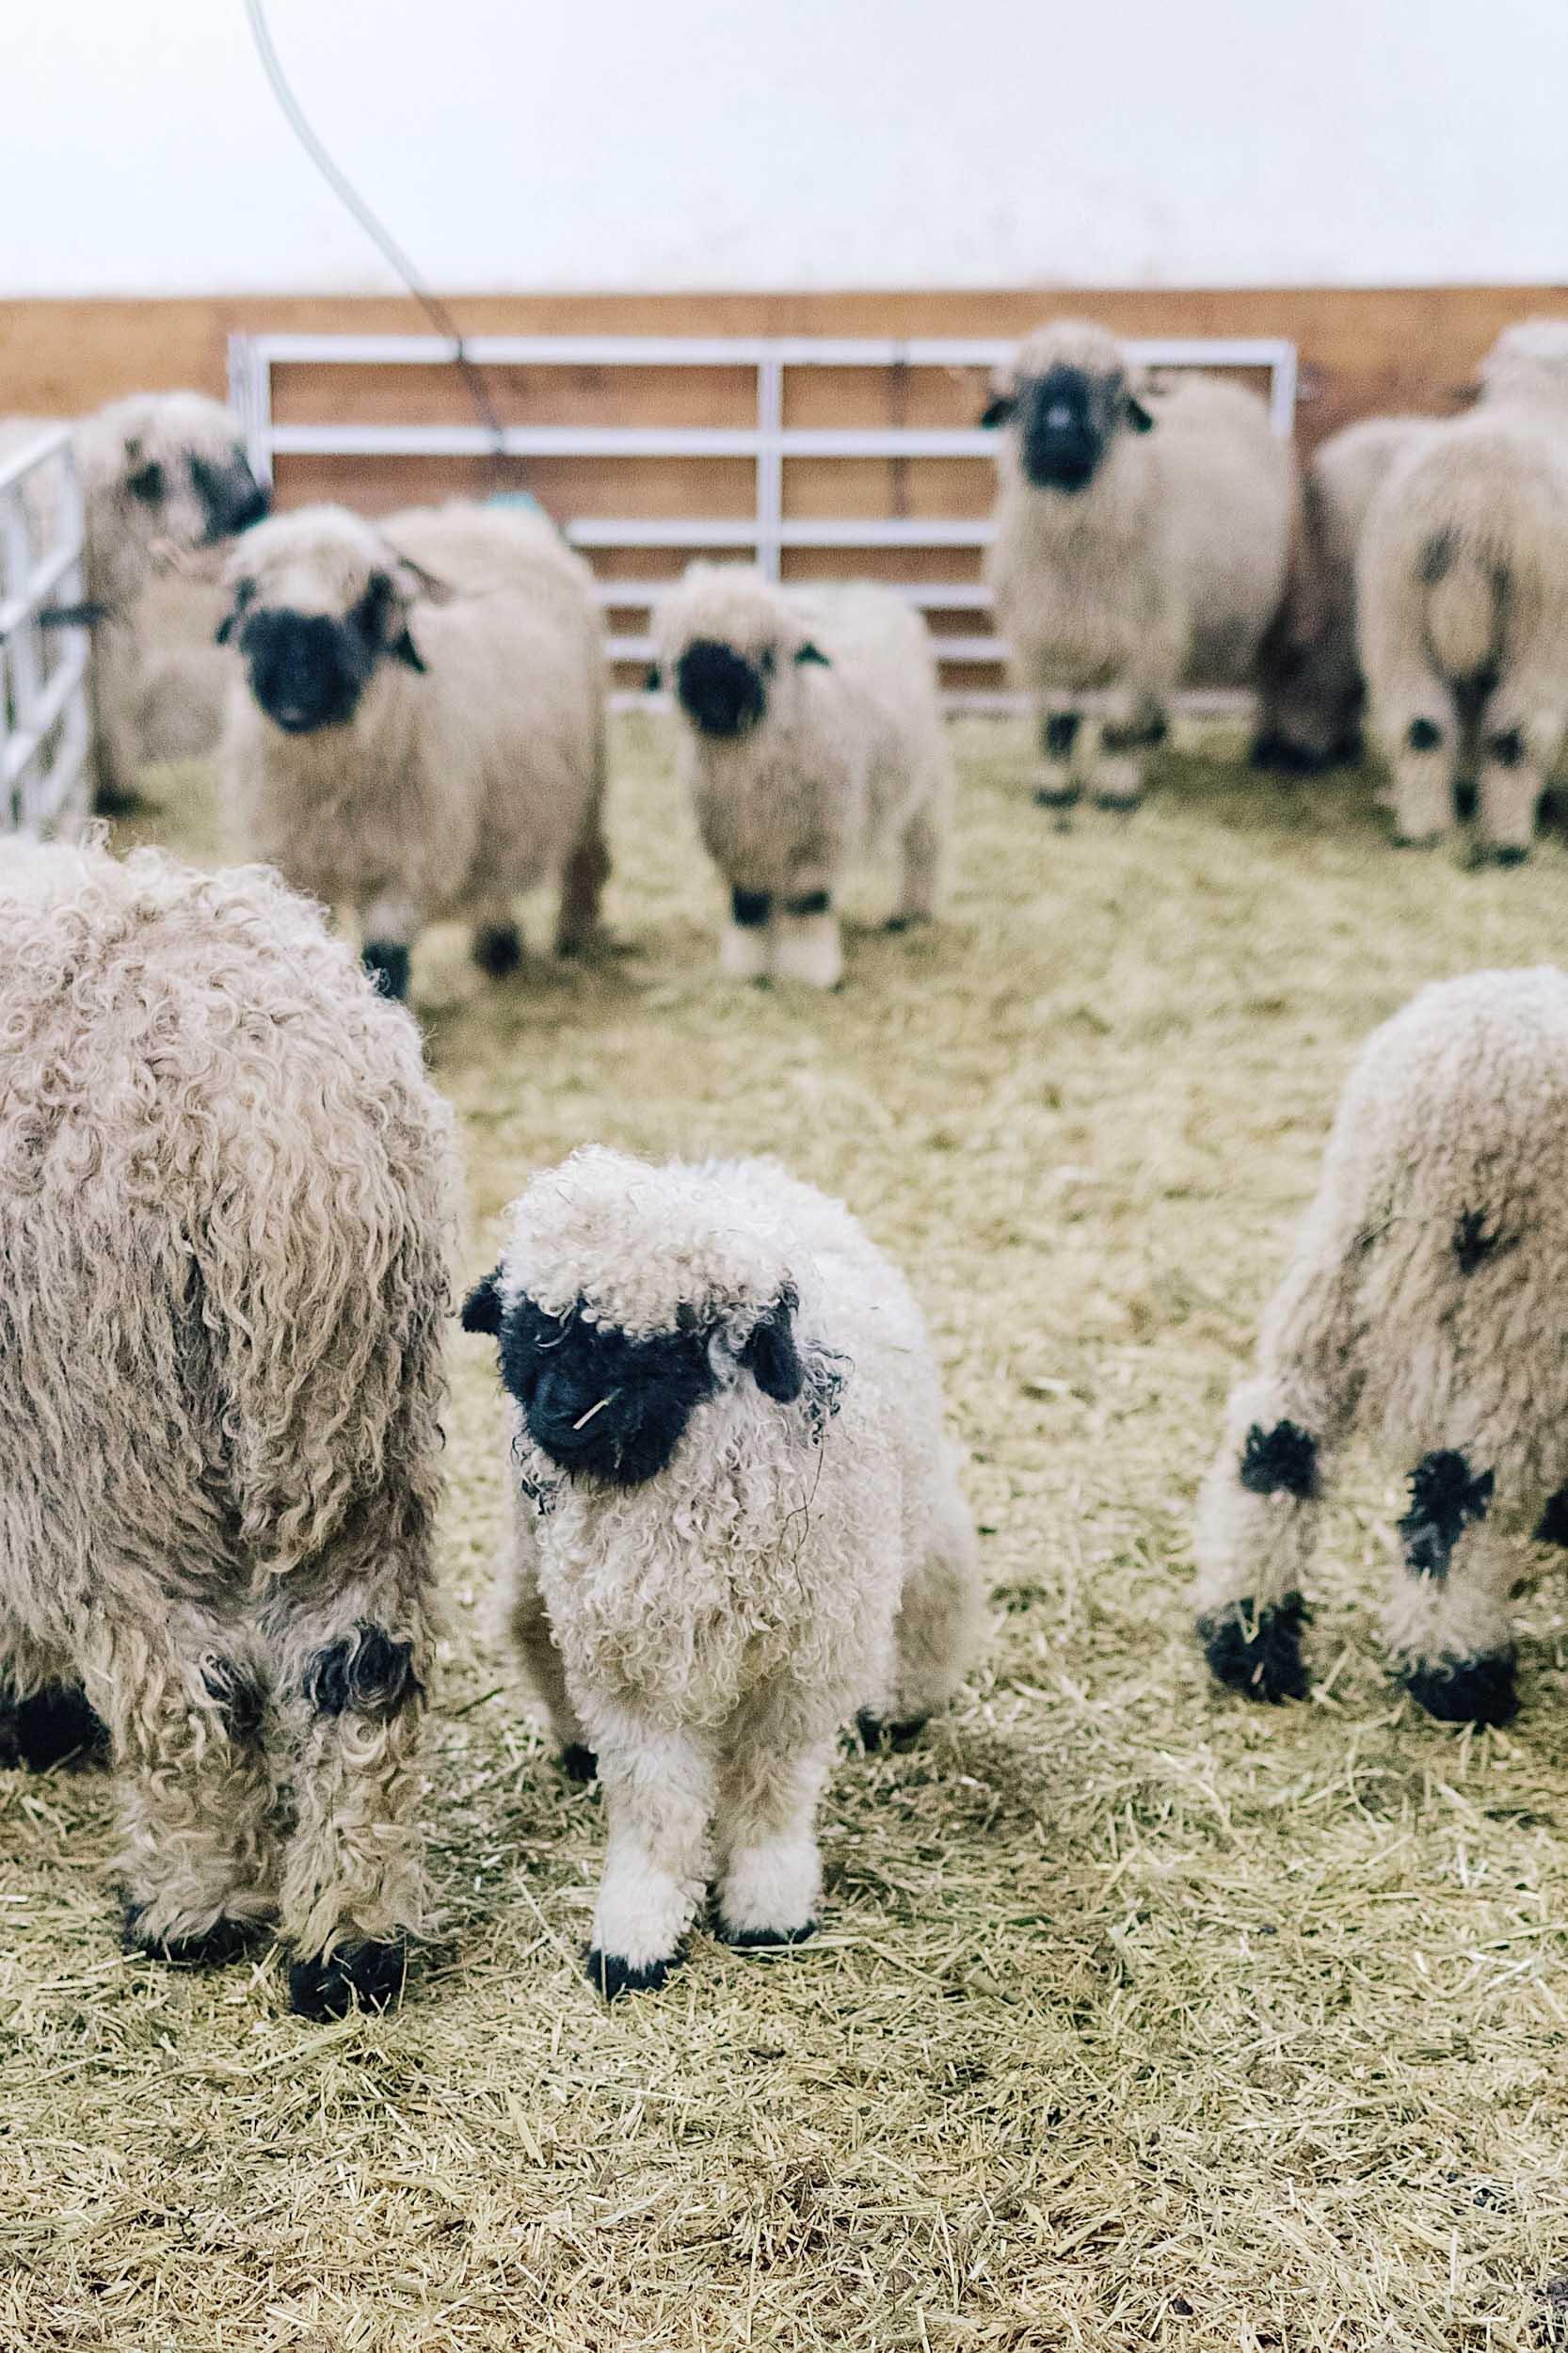 A traditional black nose sheep farm in Zermatt, Switzerland